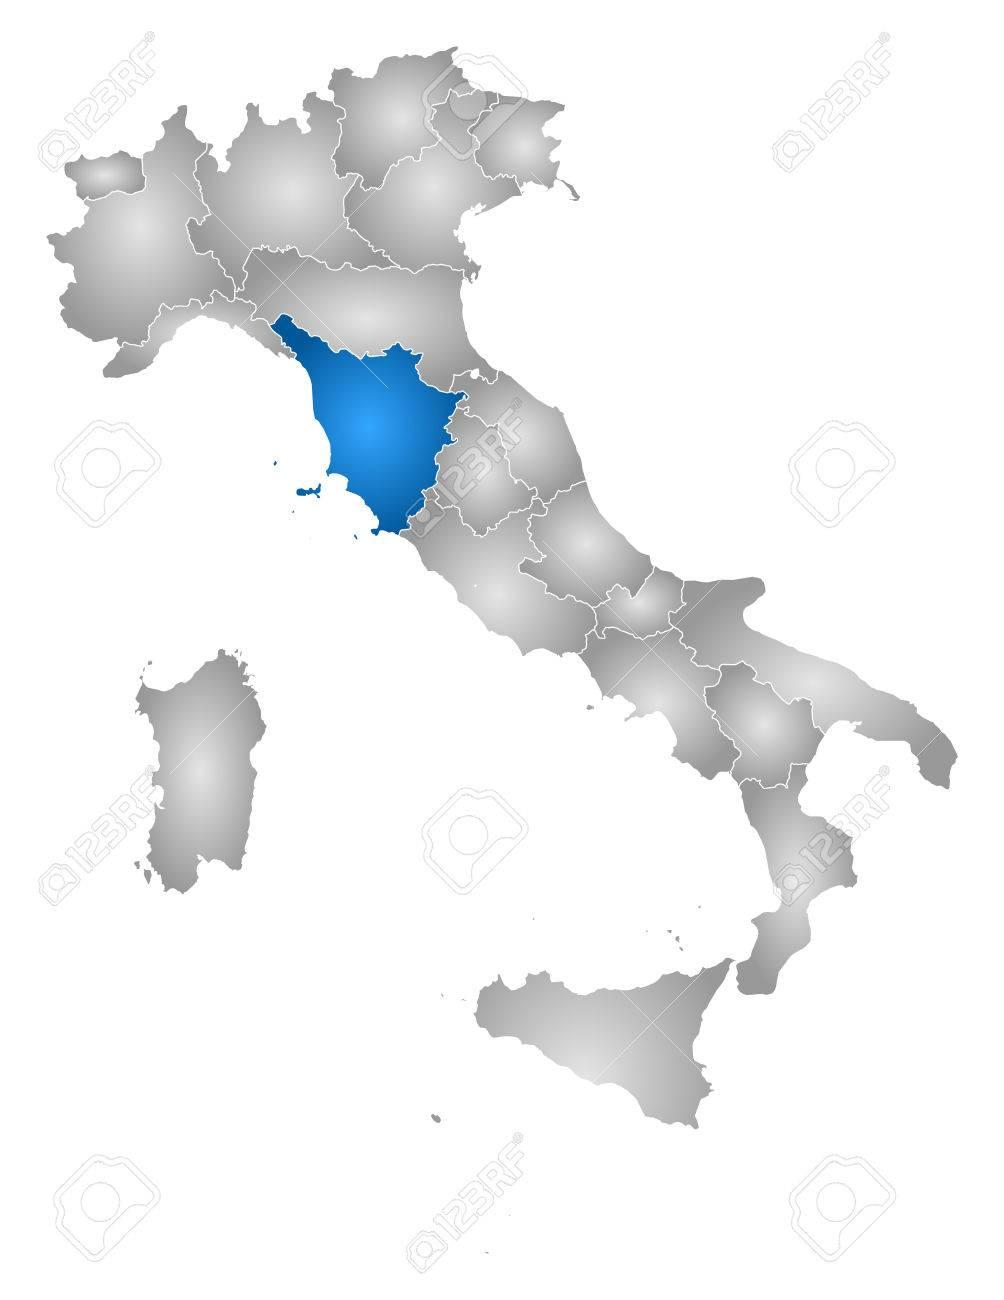 Toskana Karte Italien.Stock Photo